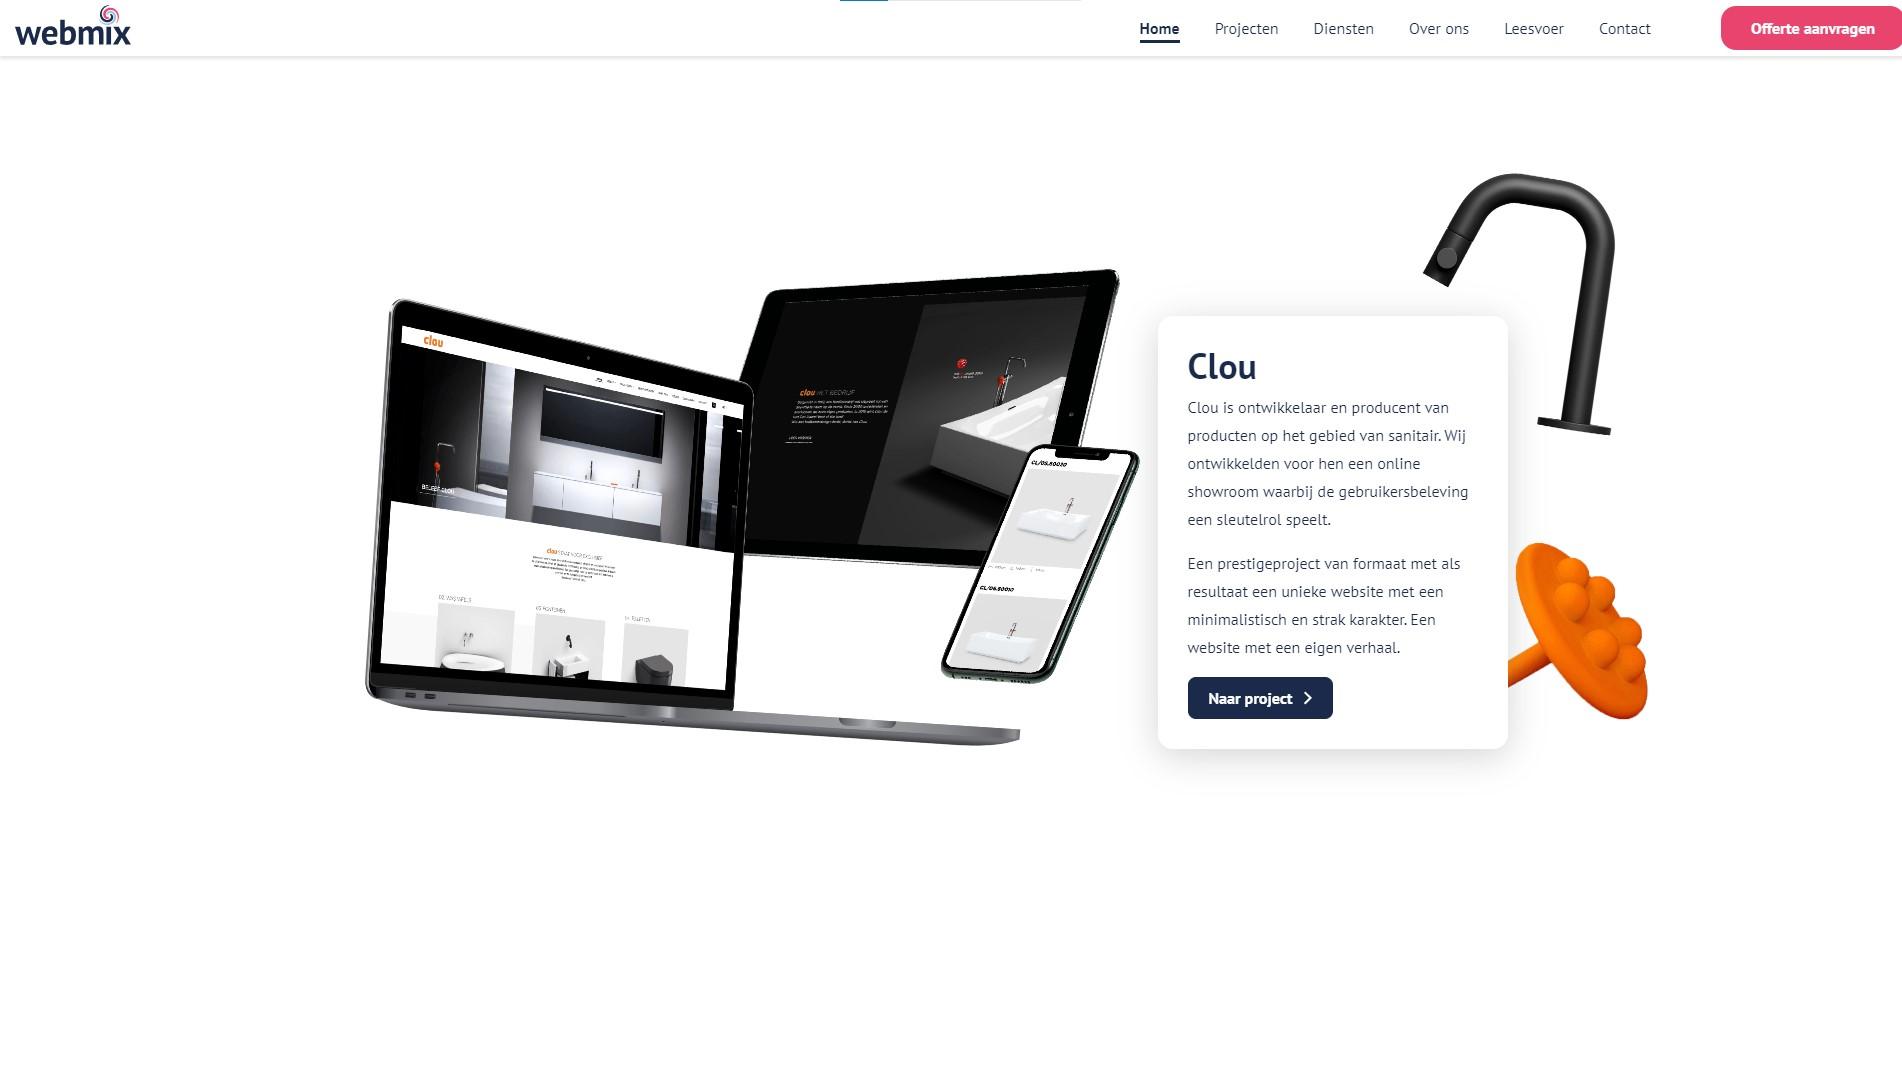 Orpetron Web Design Awards - Webmix - Web Design Awards Inspiration Trends UI UX